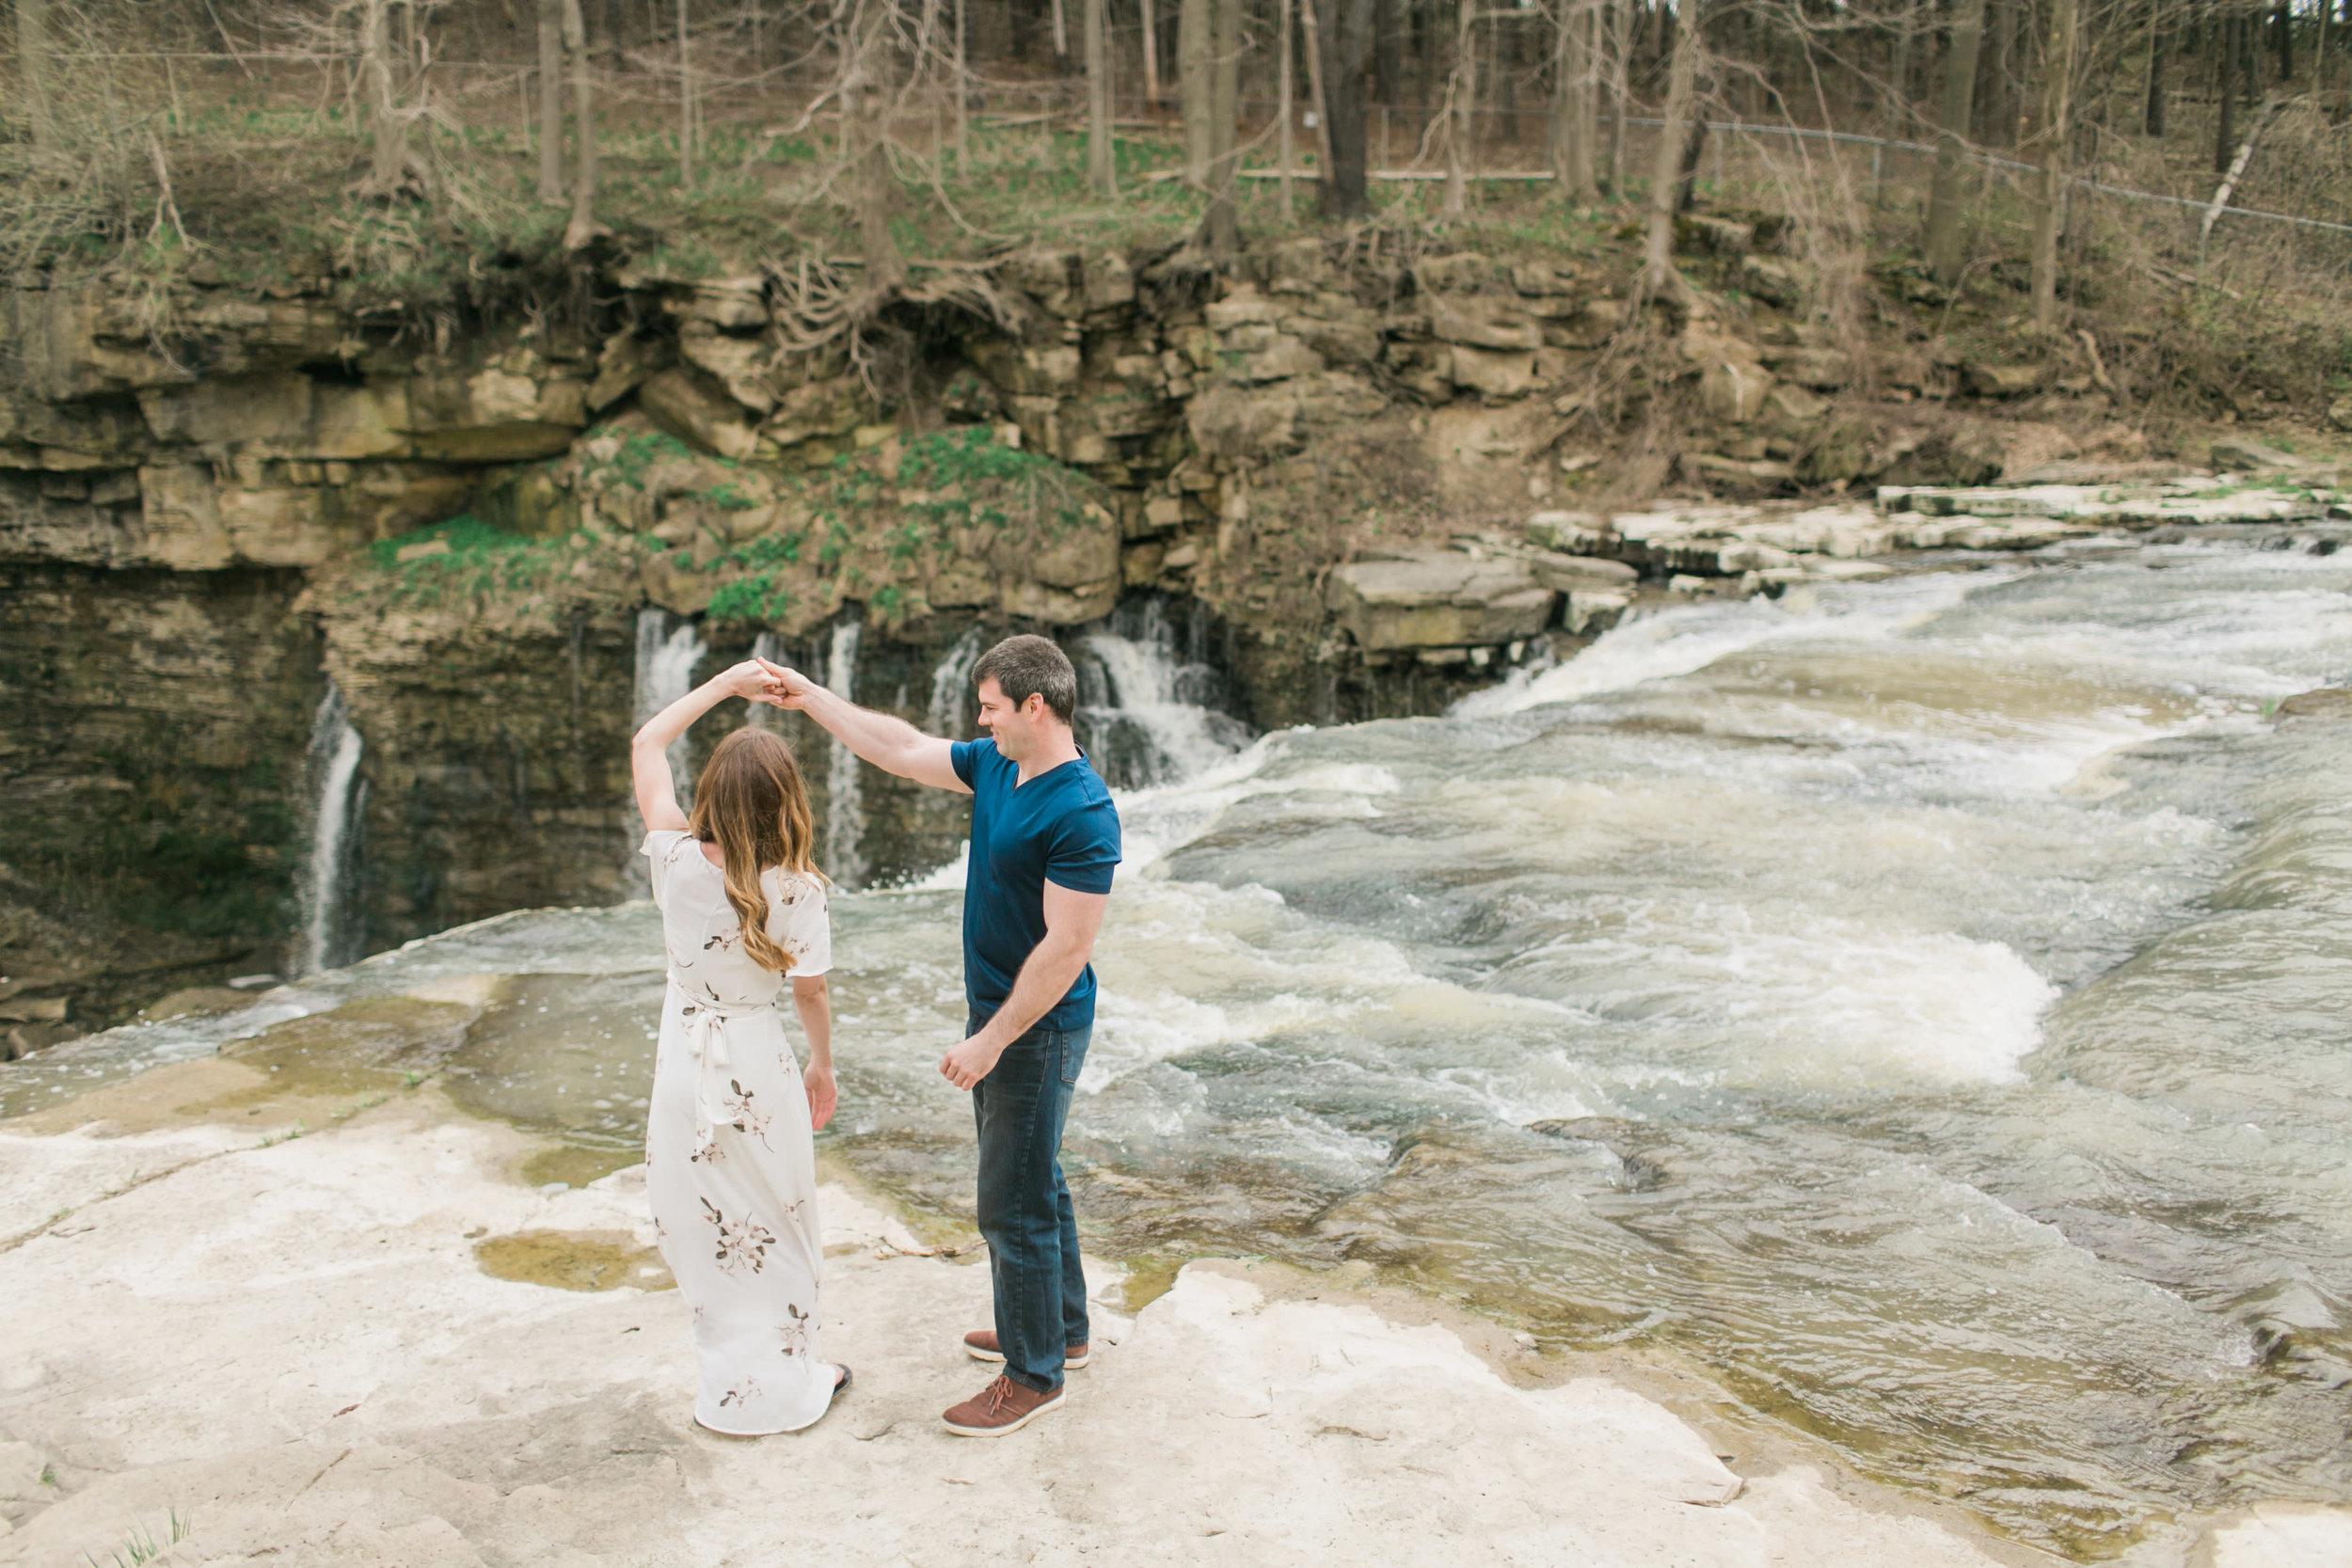 Holly___Ian___Engagement_Session___Daniel_Ricci_Wedding_Photography_10.jpg